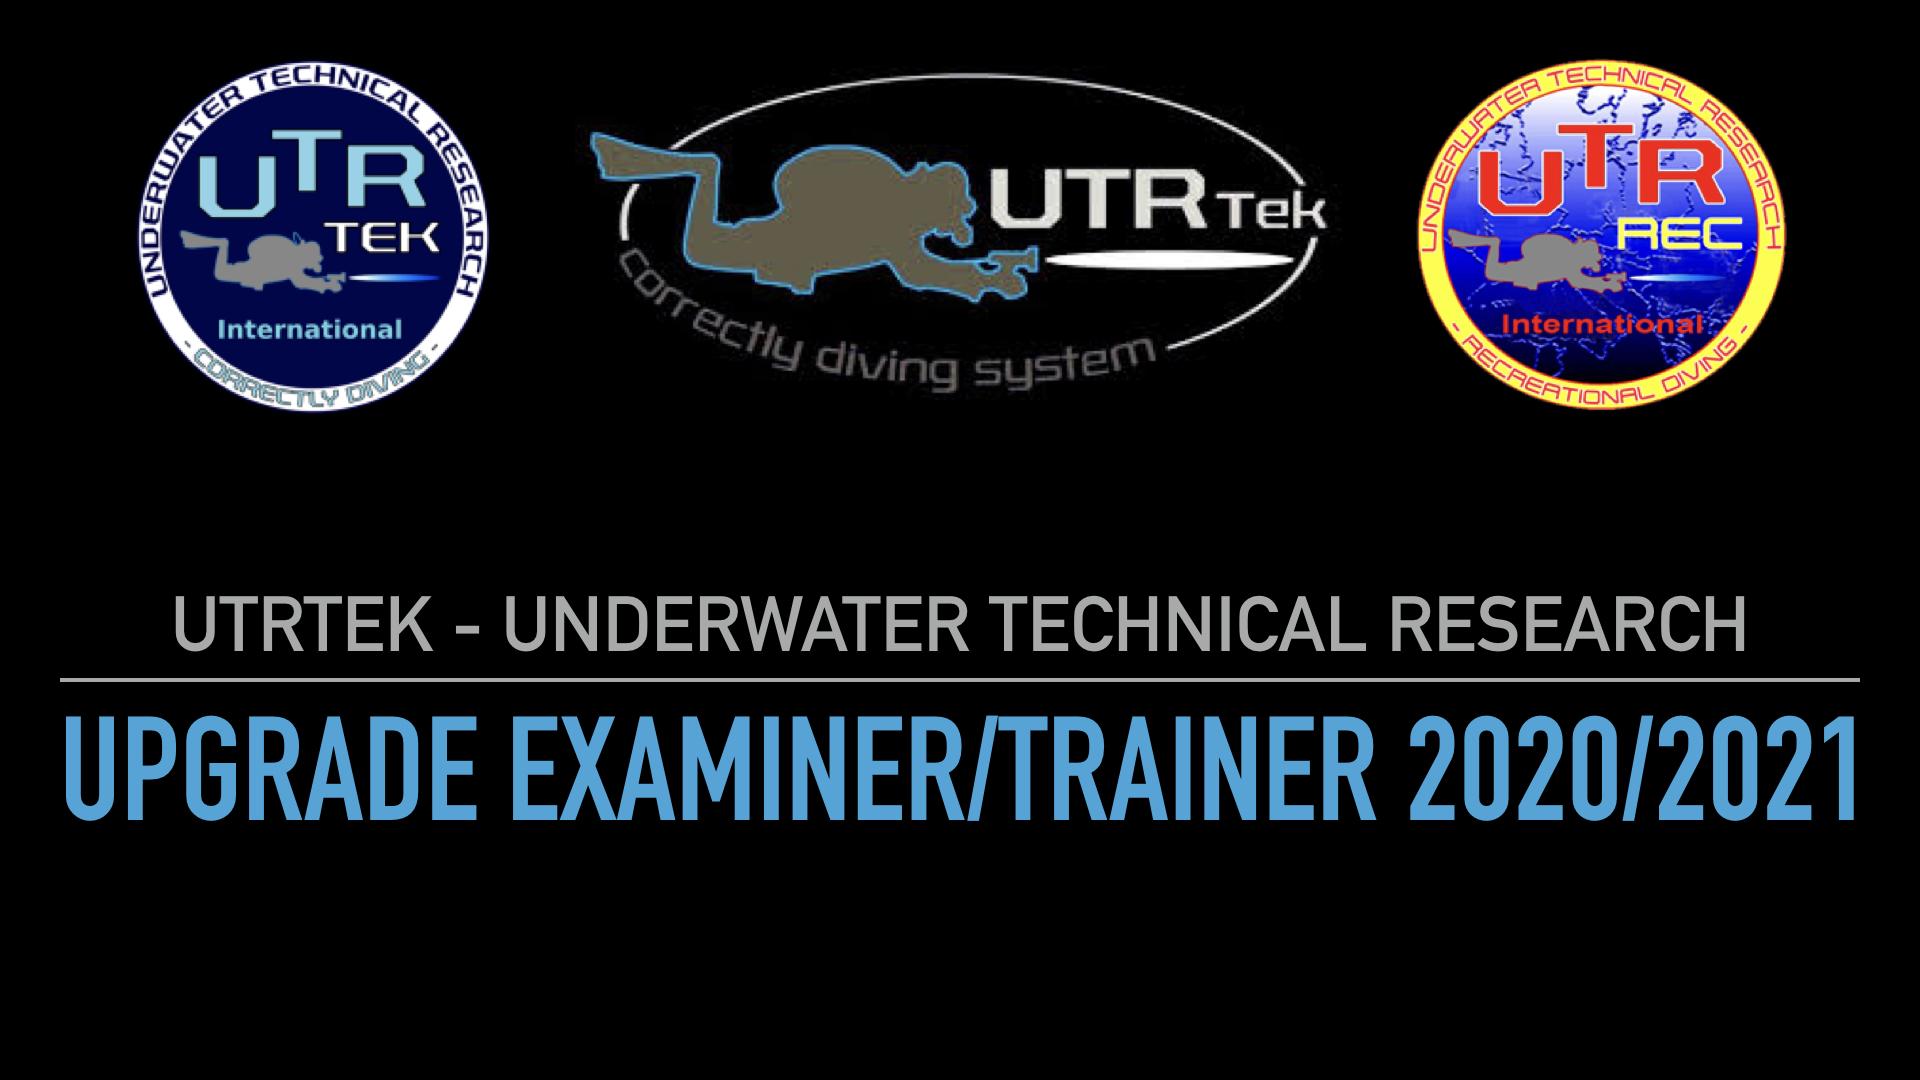 UPGRADE EXAMINER/TRAINER 2020/2021